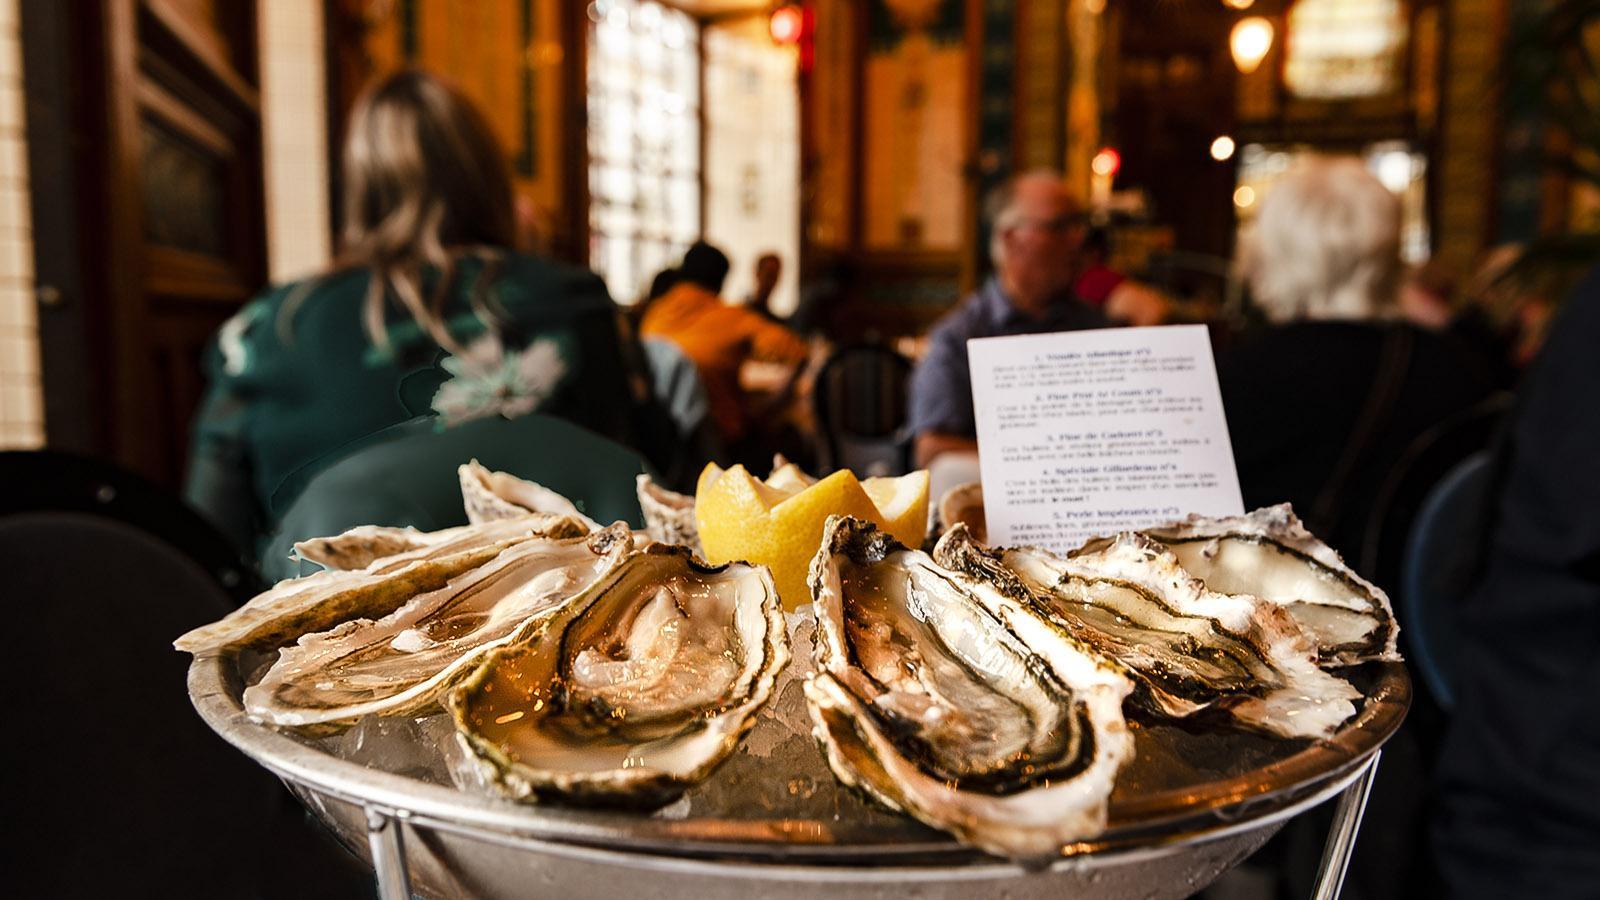 Nantes: Austern satt in Le Cigale. Foto: HIlke Maunder